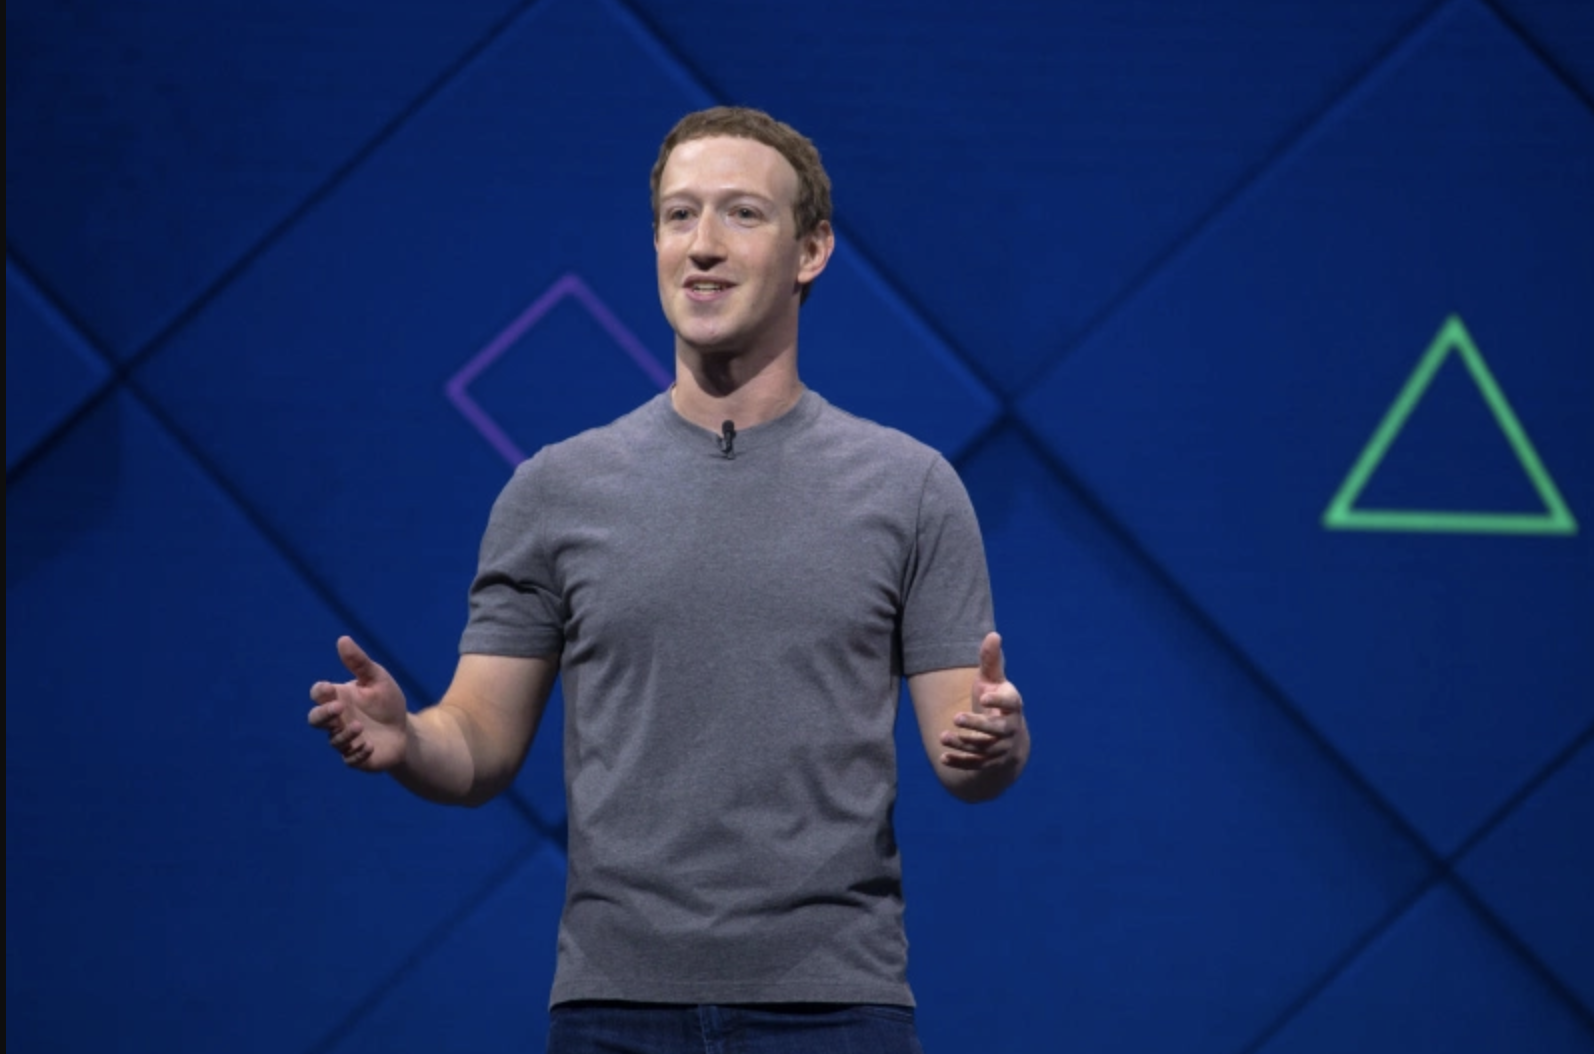 Mark Zuckerberg finally responds to Cambridge Analytica data breach